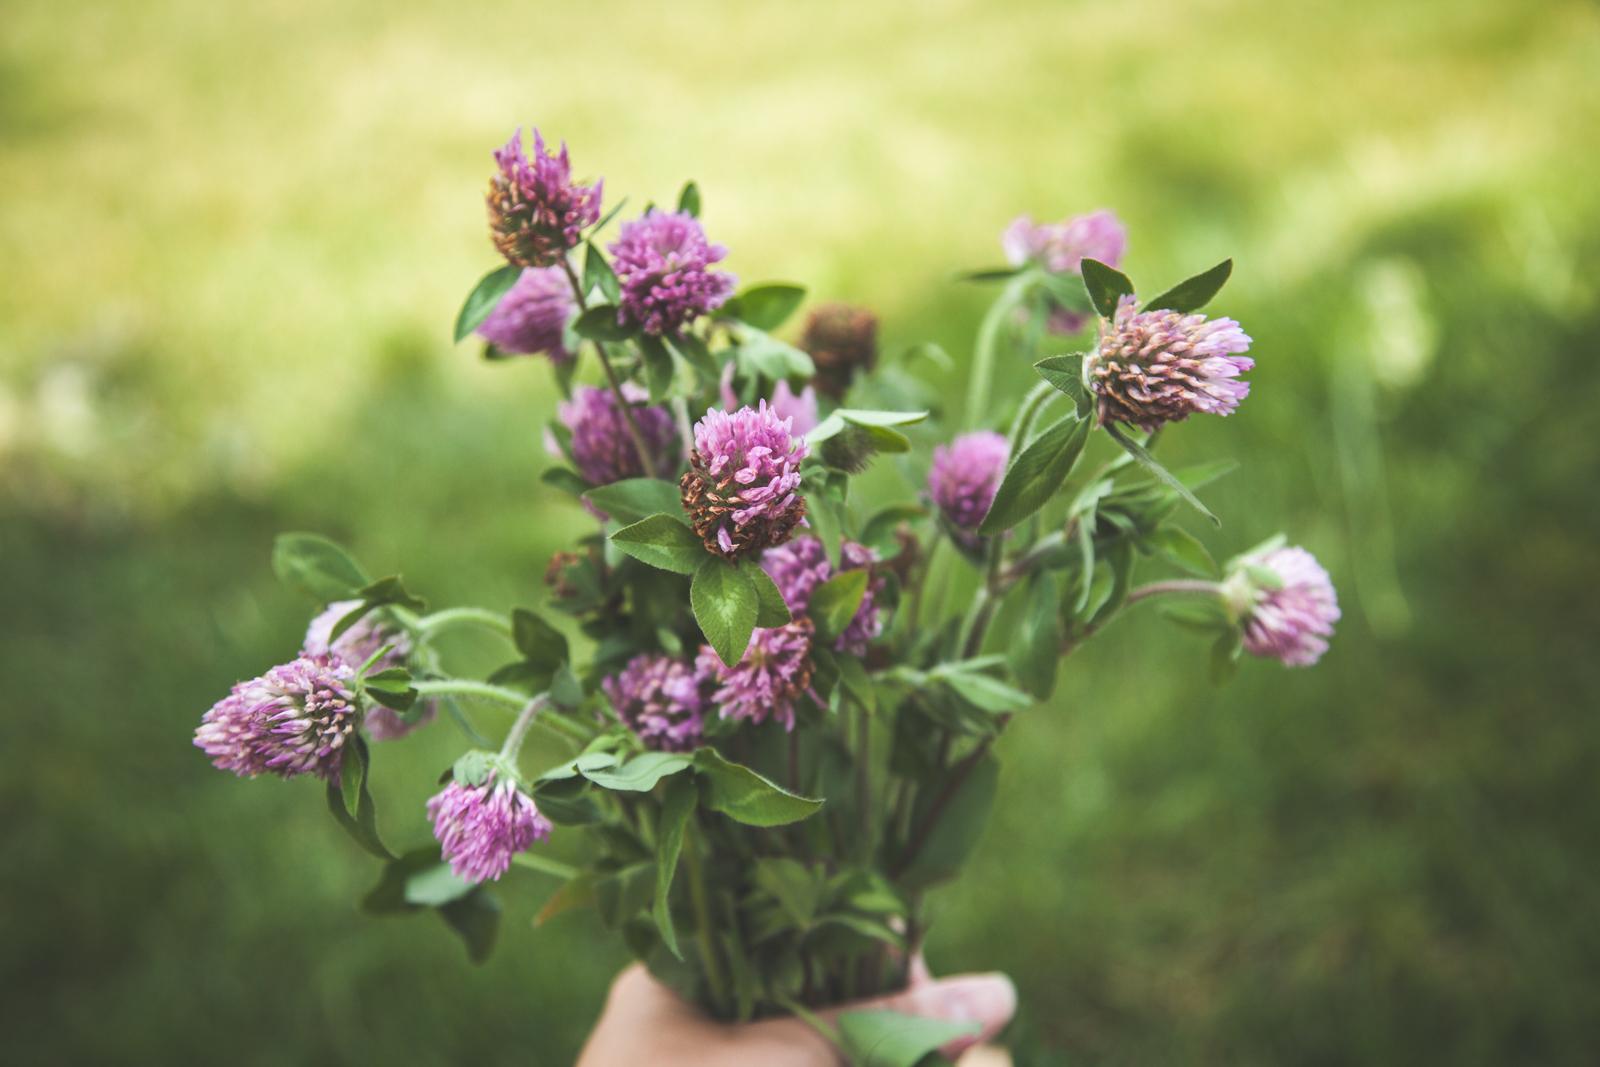 WildflowersPart2-sm-0510.jpg